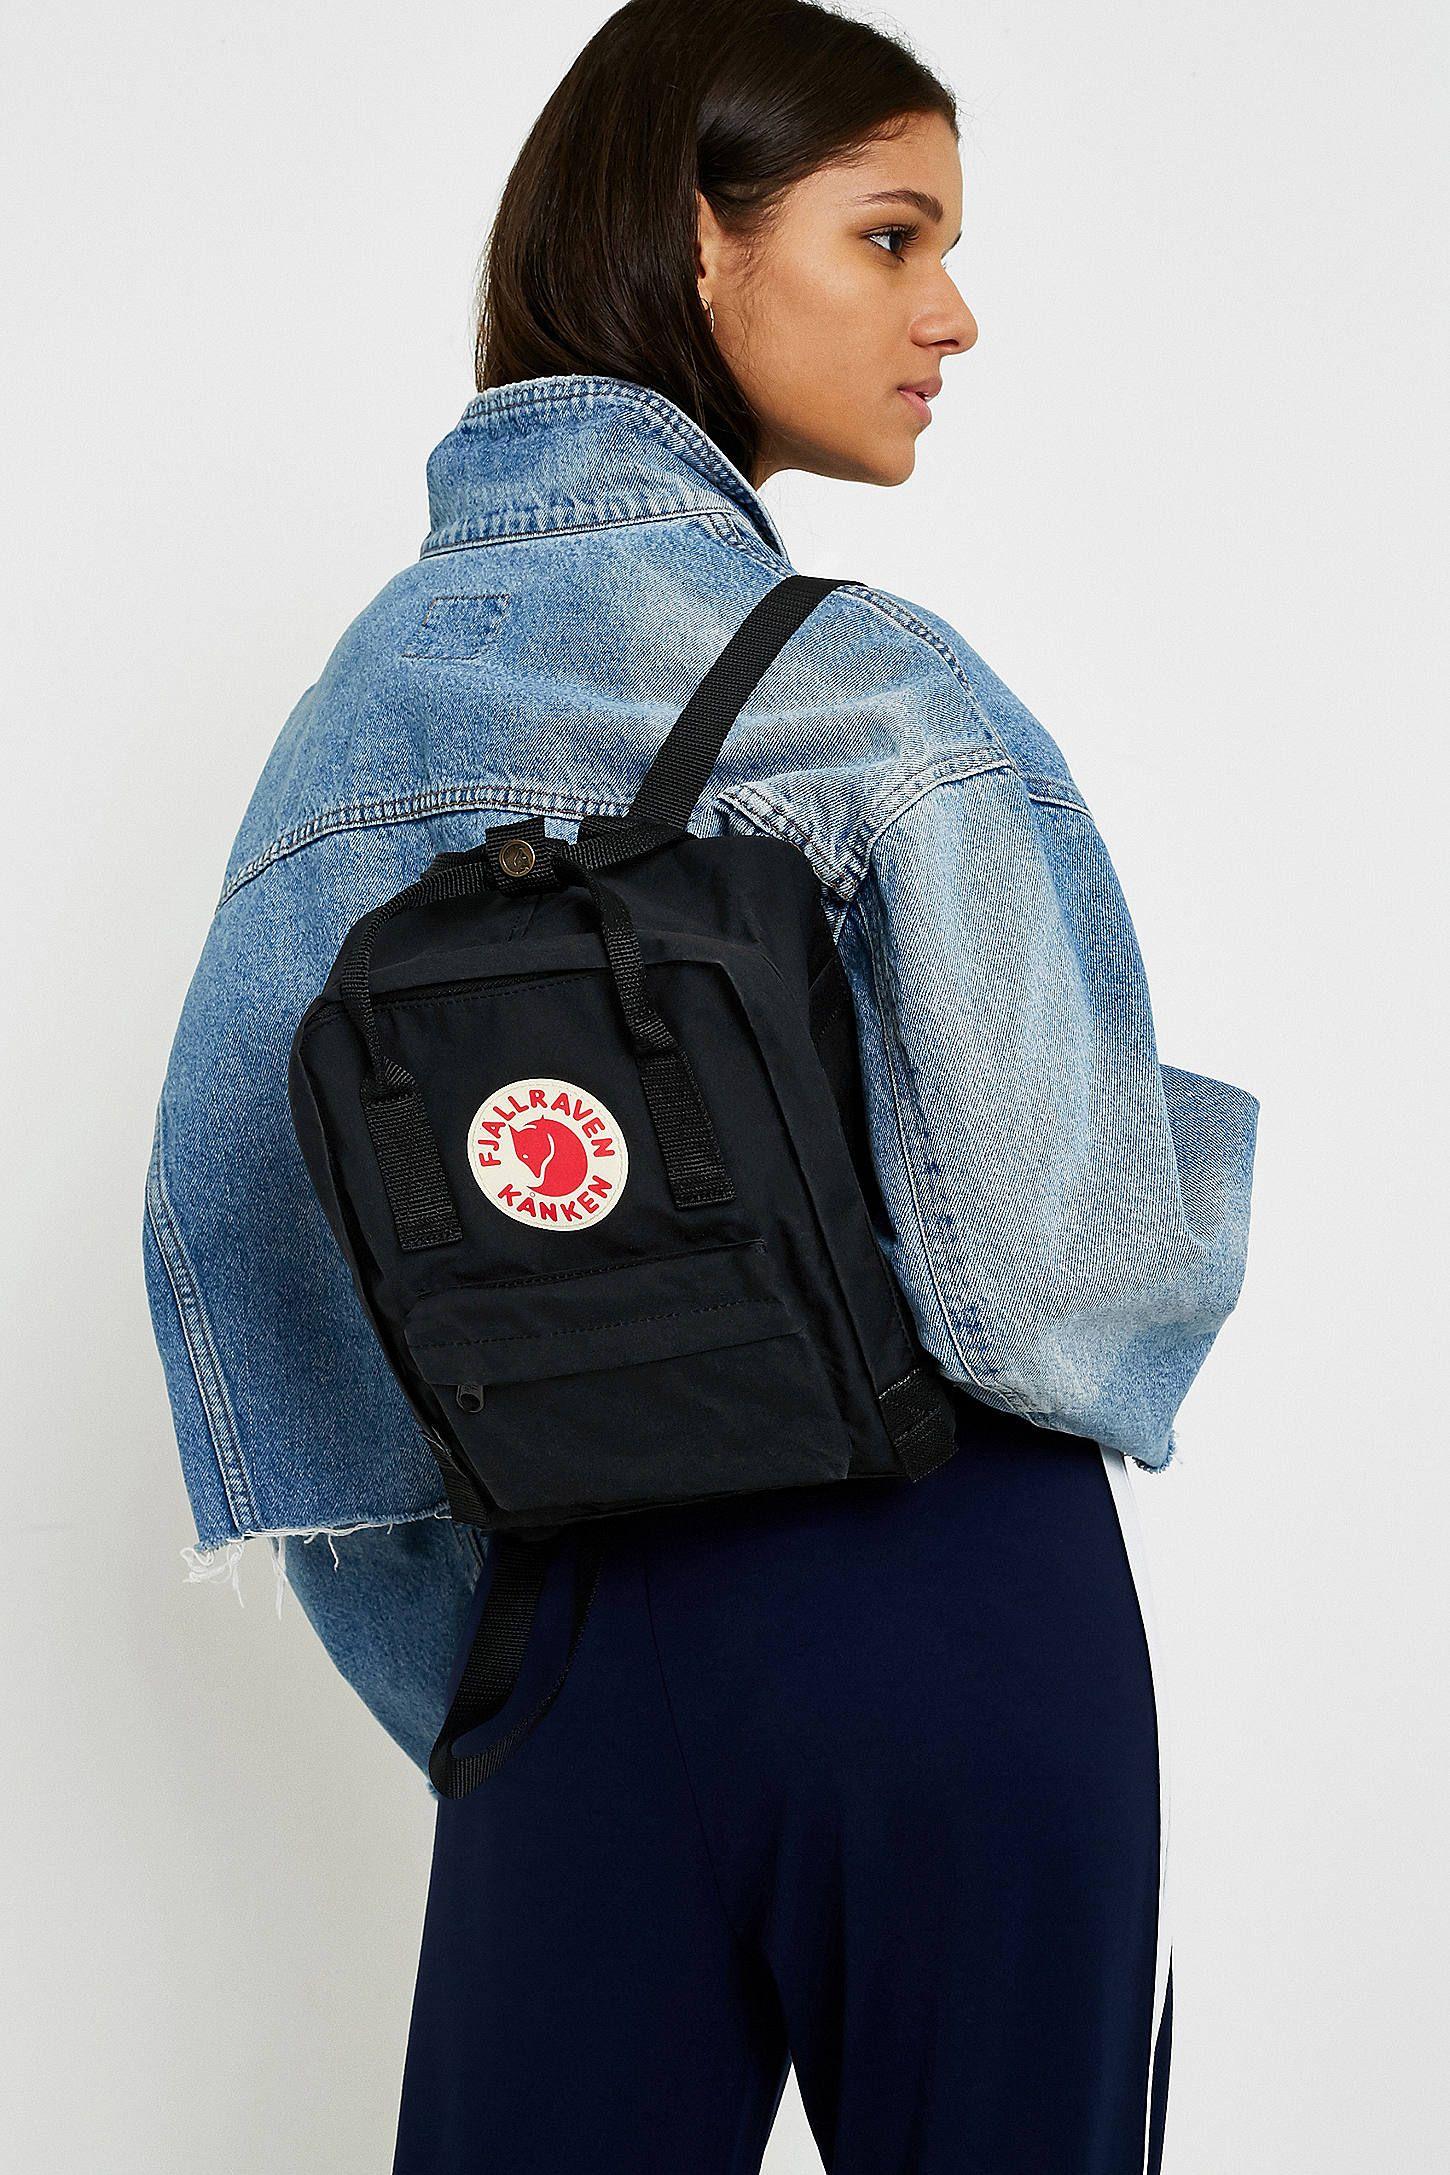 dd2f76c96186d Fjallraven Kanken Black Mini Backpack in 2019